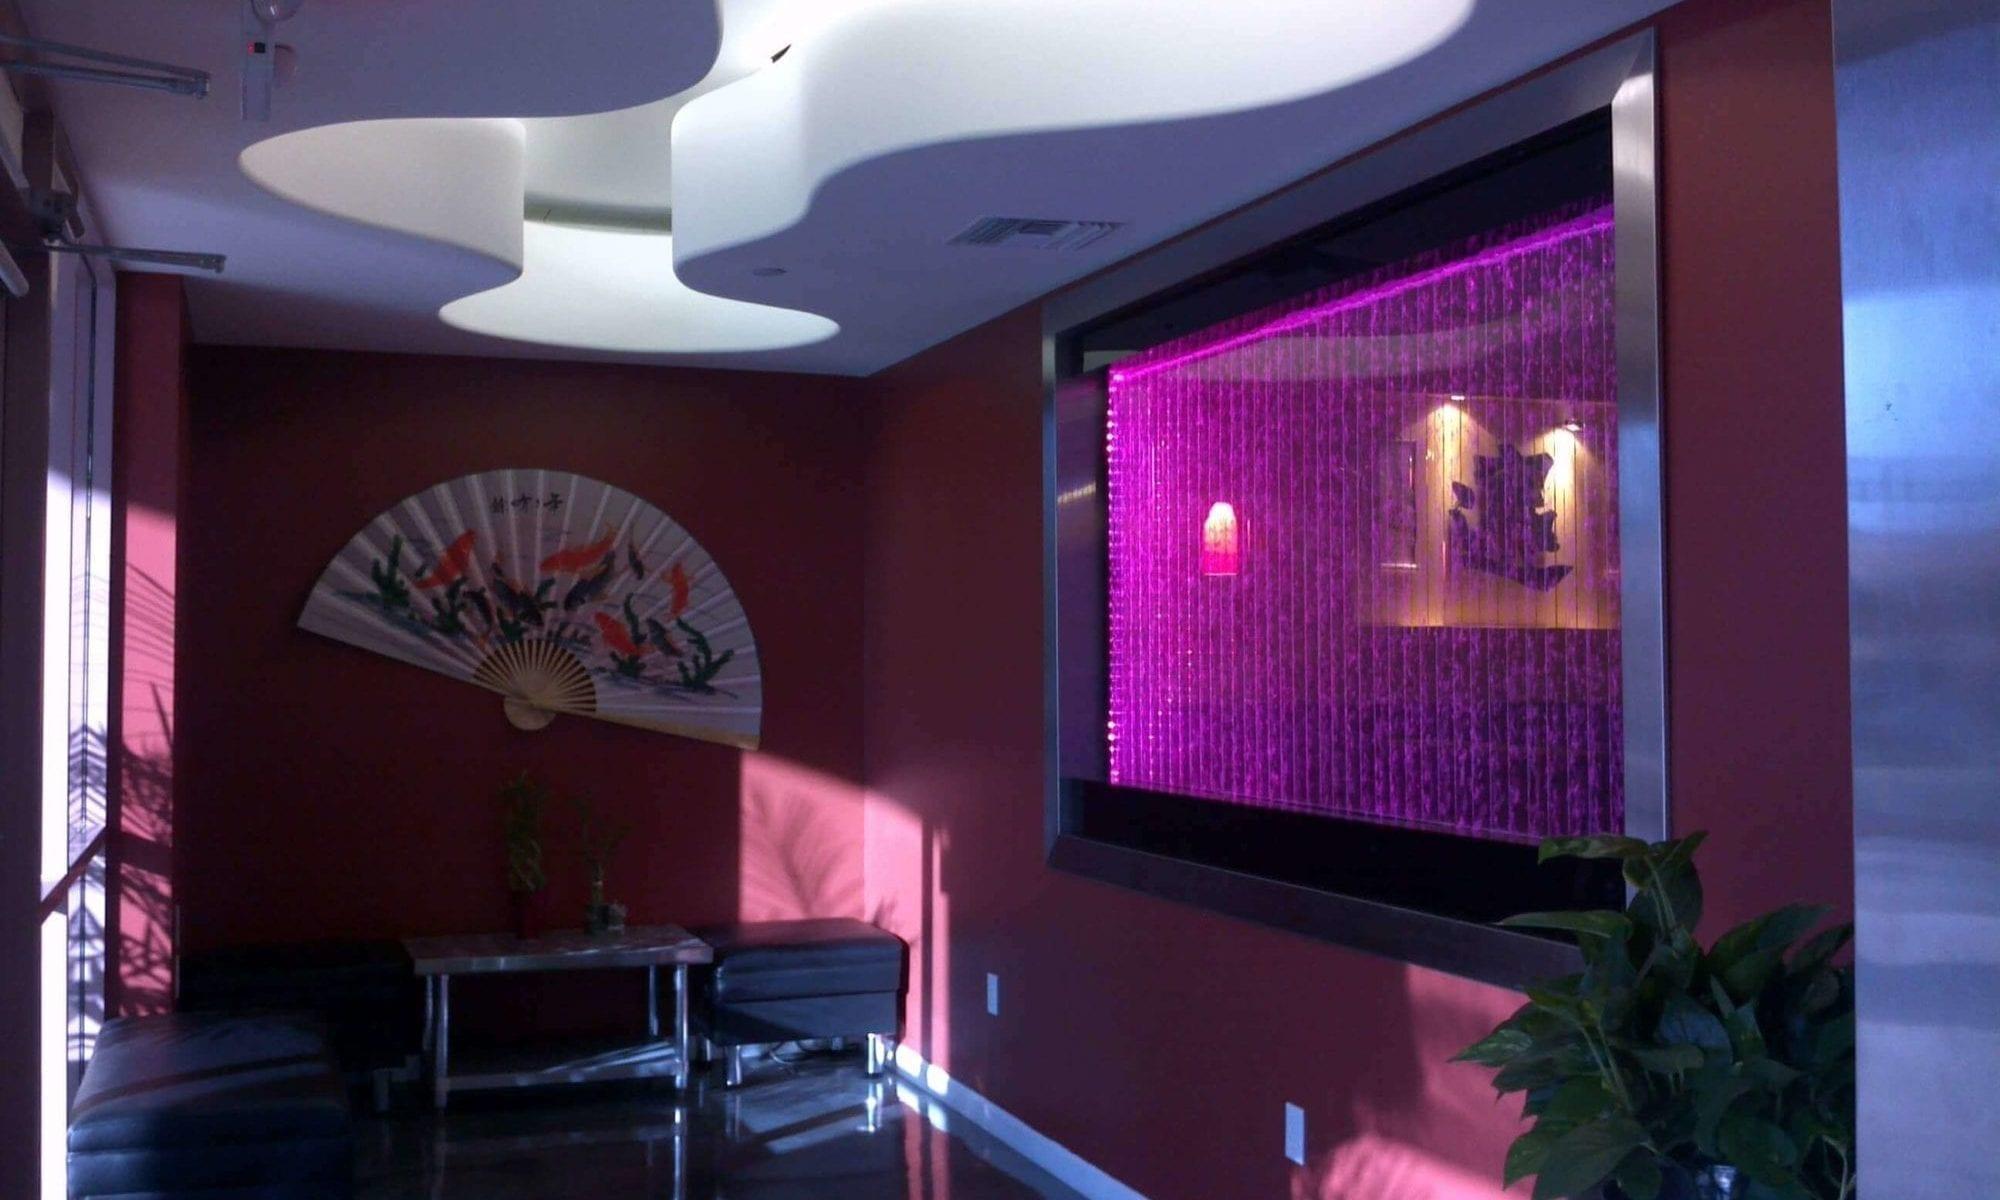 Sushi Restaurant OK window mounted bubble wall